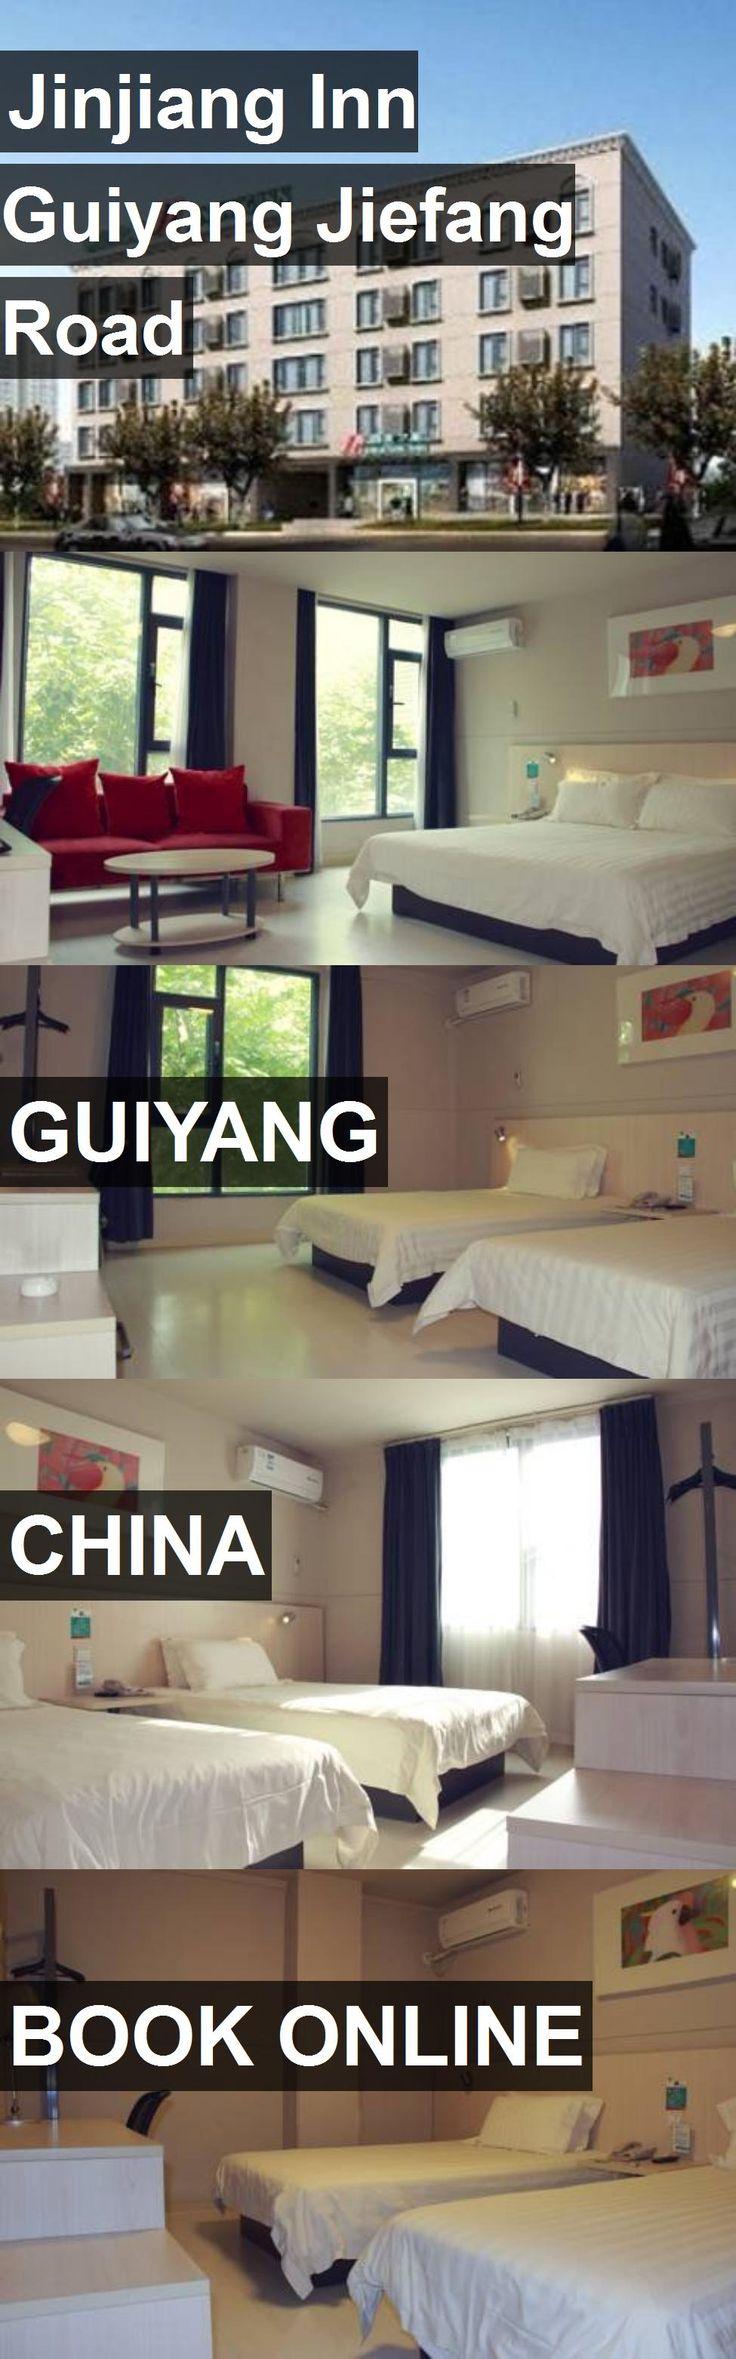 Hotel Jinjiang Inn Guiyang Jiefang Road in Guiyang, China. For more information, photos, reviews and best prices please follow the link. #China #Guiyang #JinjiangInnGuiyangJiefangRoad #hotel #travel #vacation